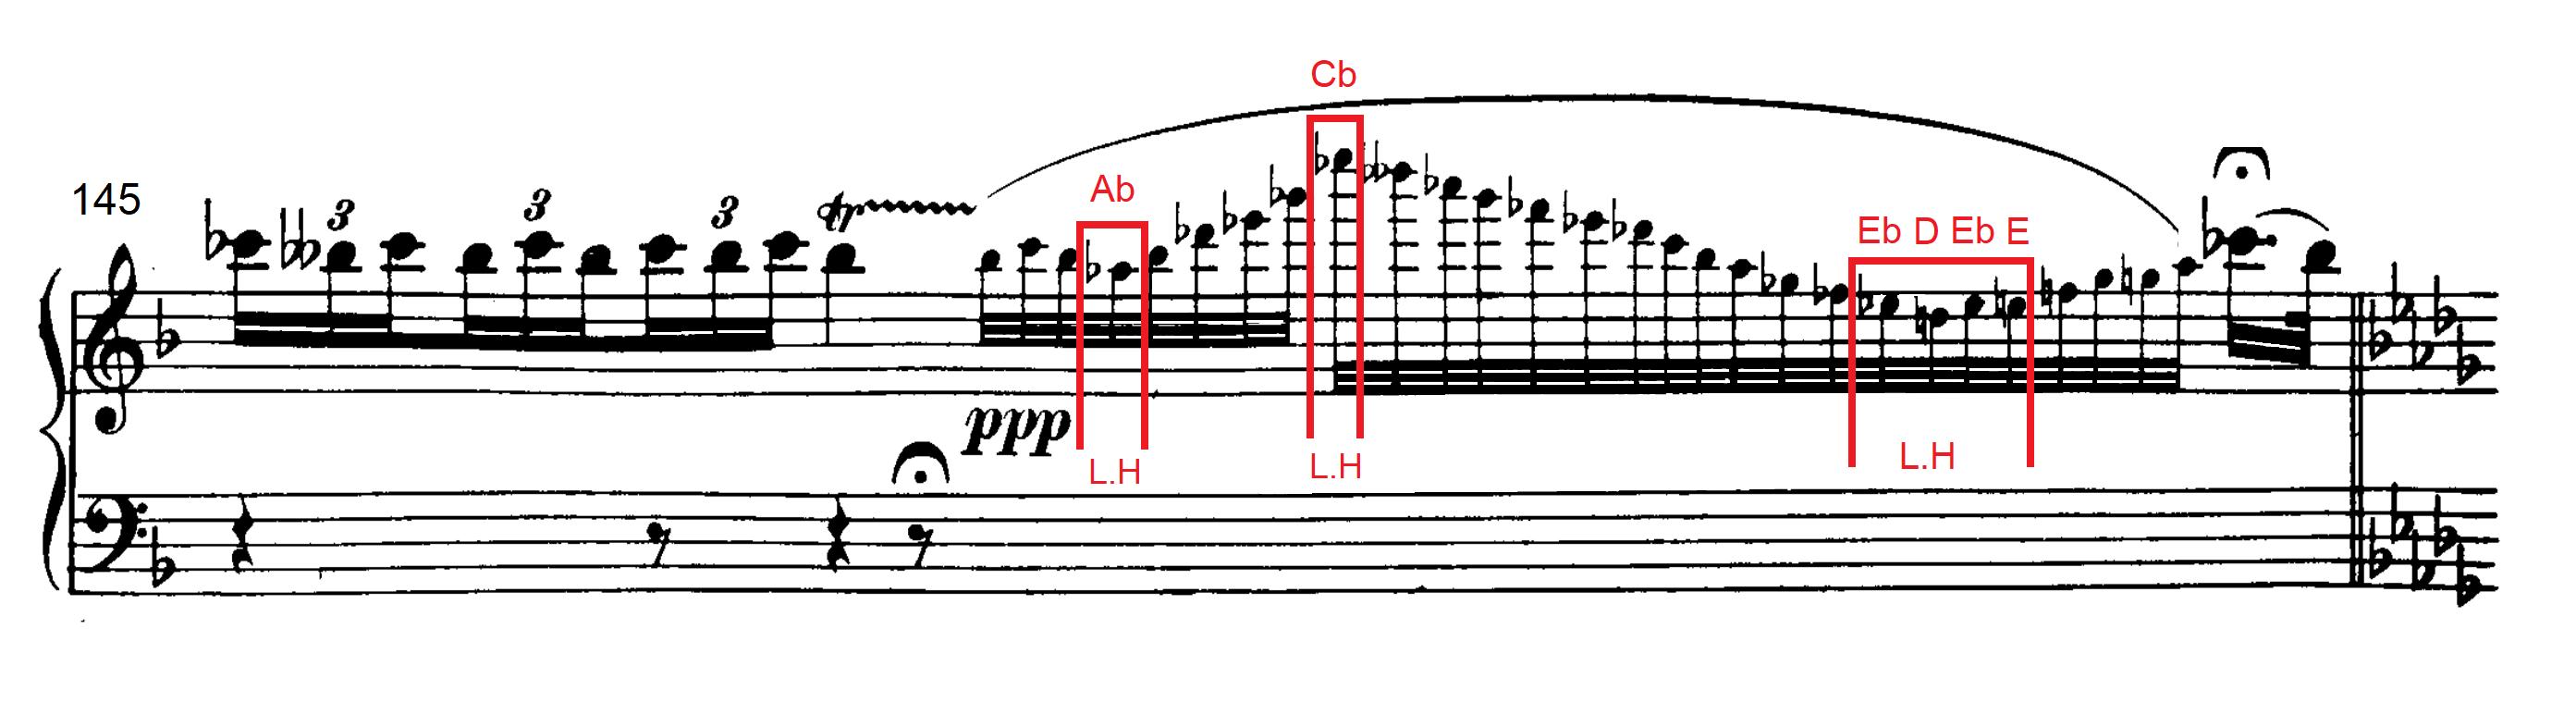 Tchaikovsky Piano Concerto No.1 Masterclass 2.10